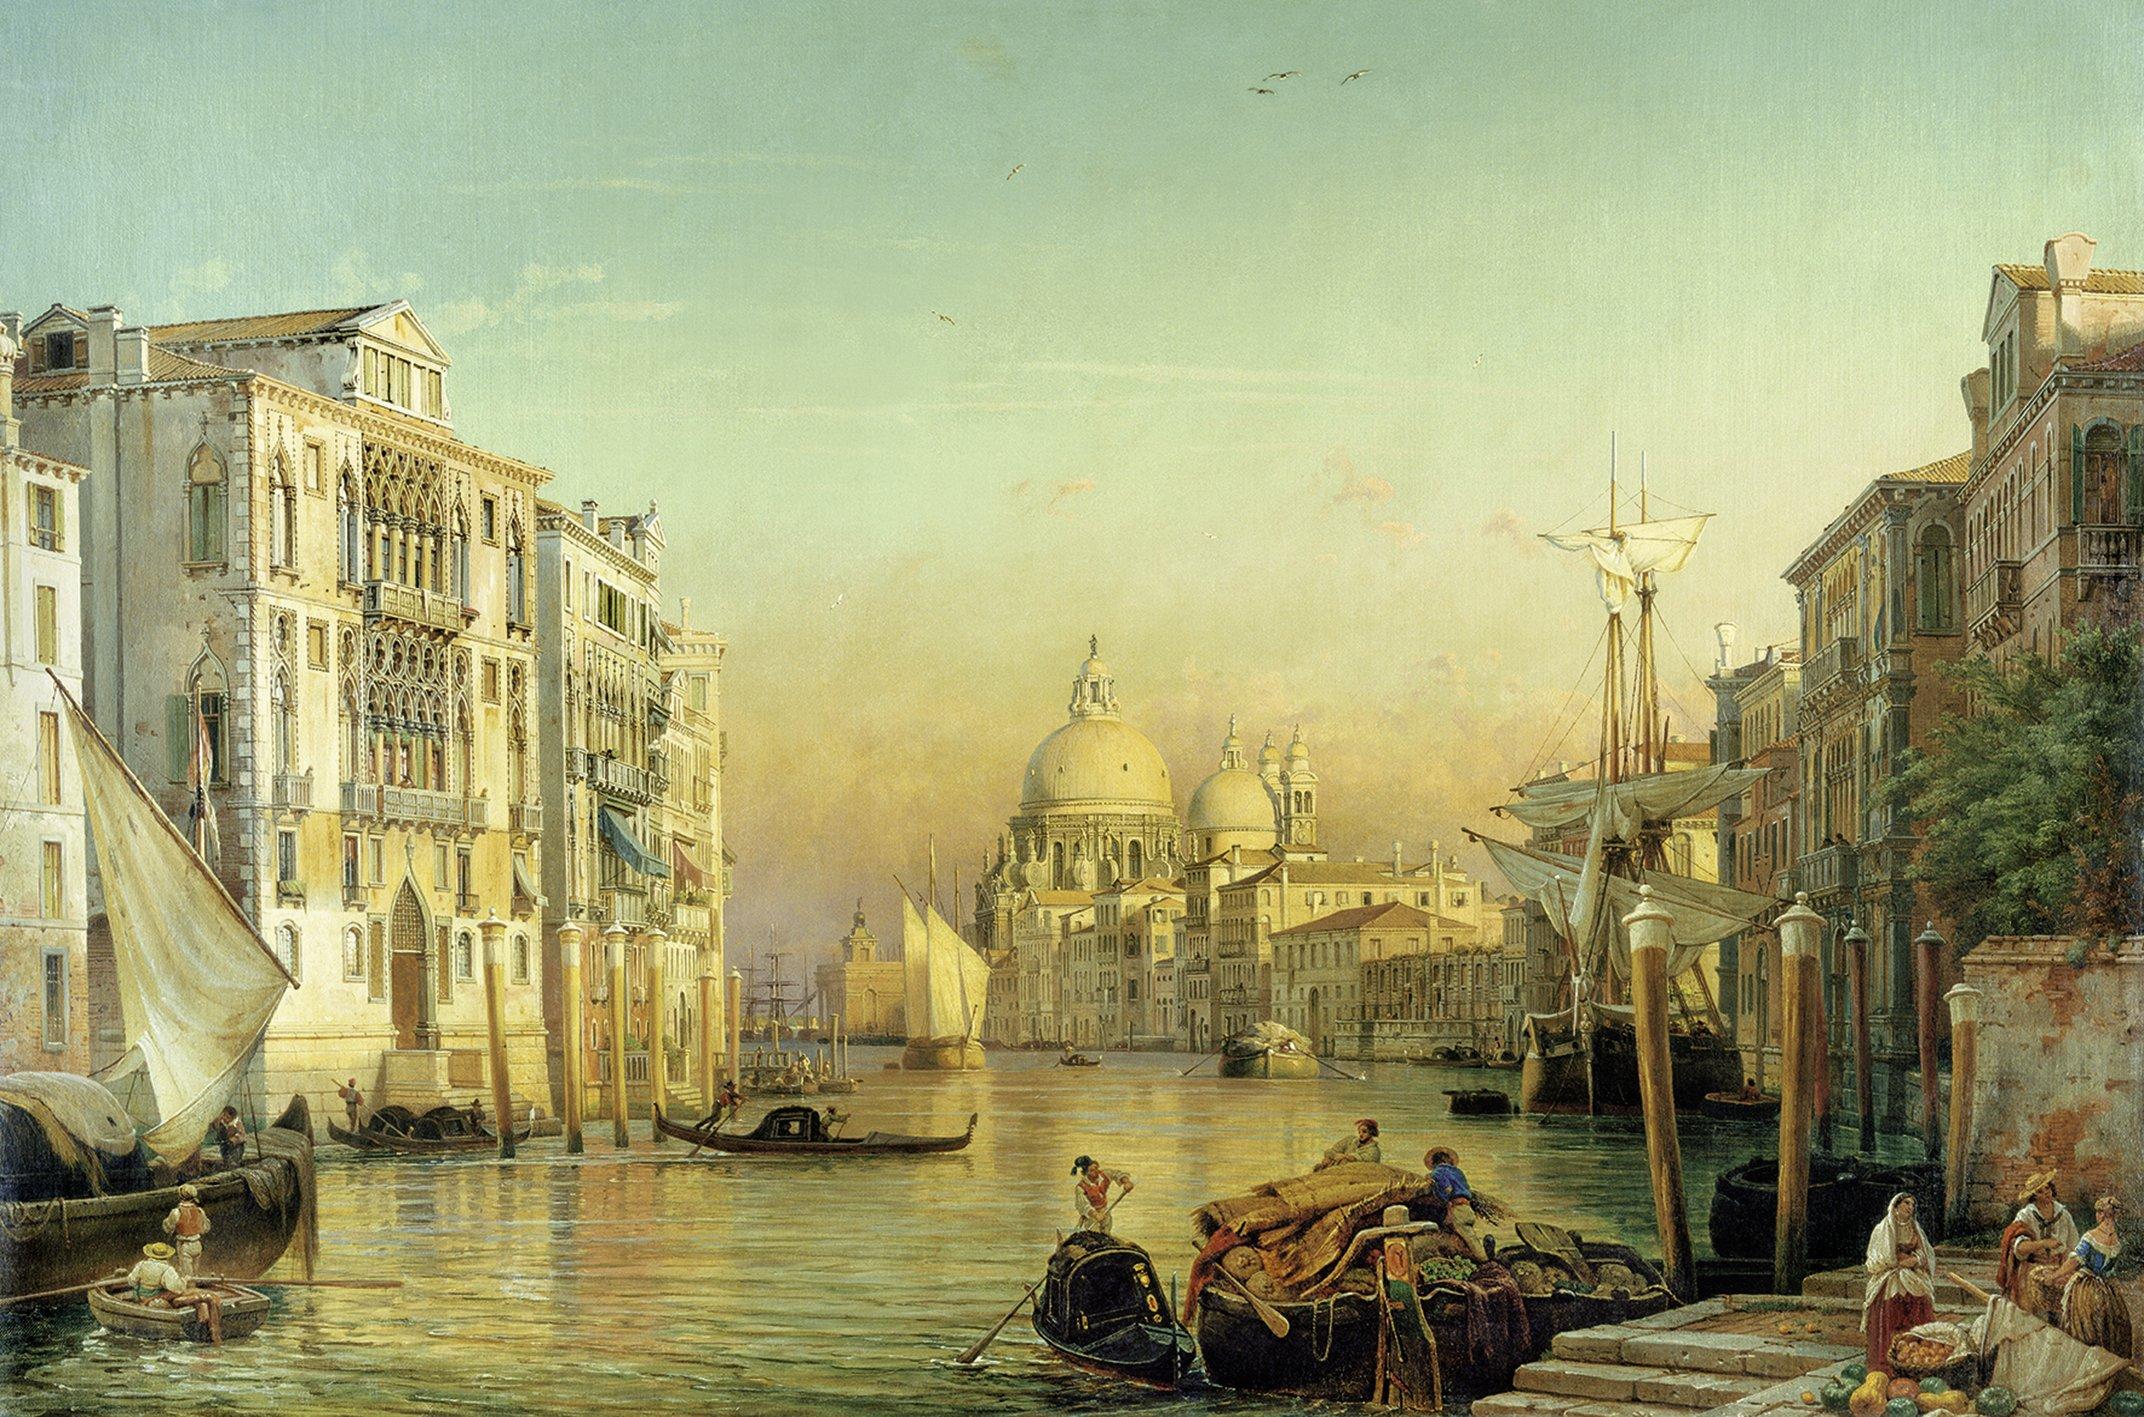 Ravensburger-17035-Nerly-Canale-Grande-Venedig-3000-Teile-Puzzle